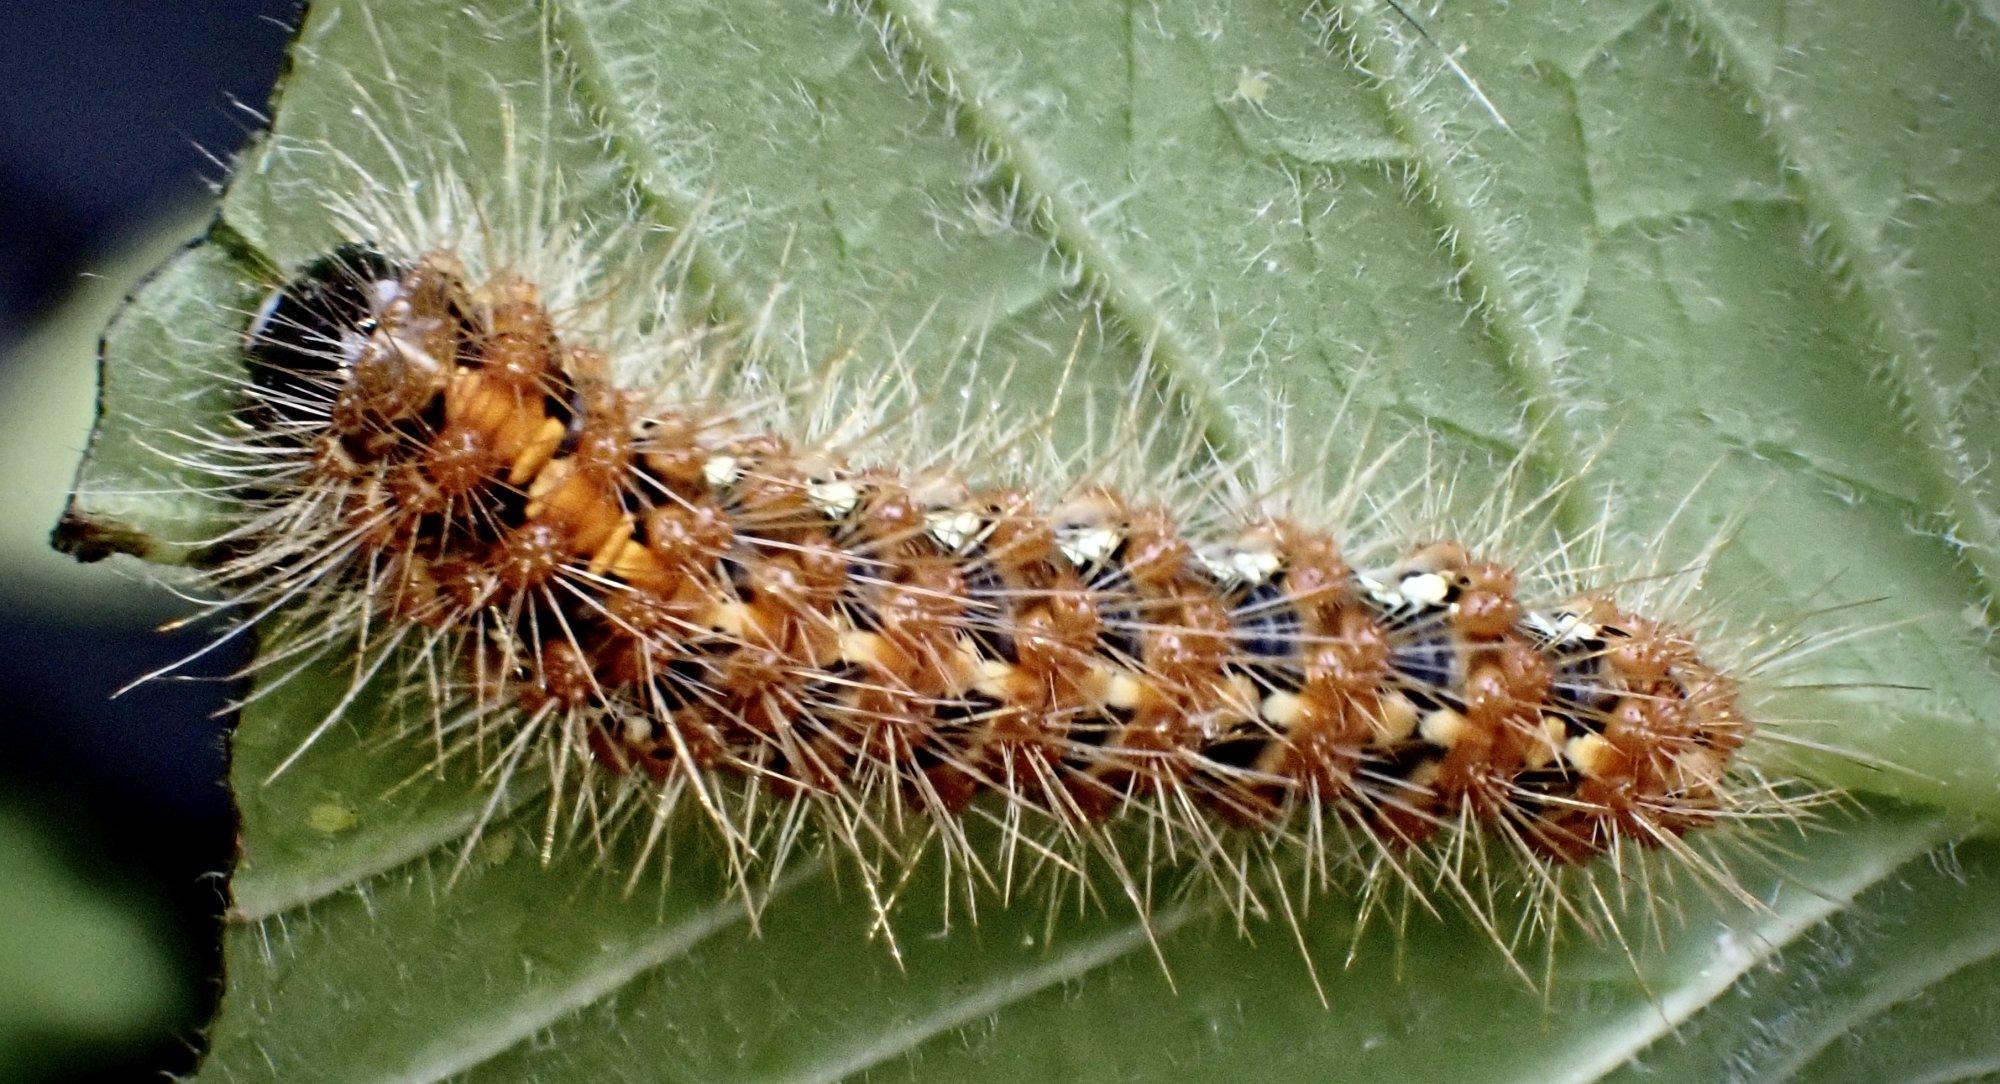 Brown tailed moth caterpillar